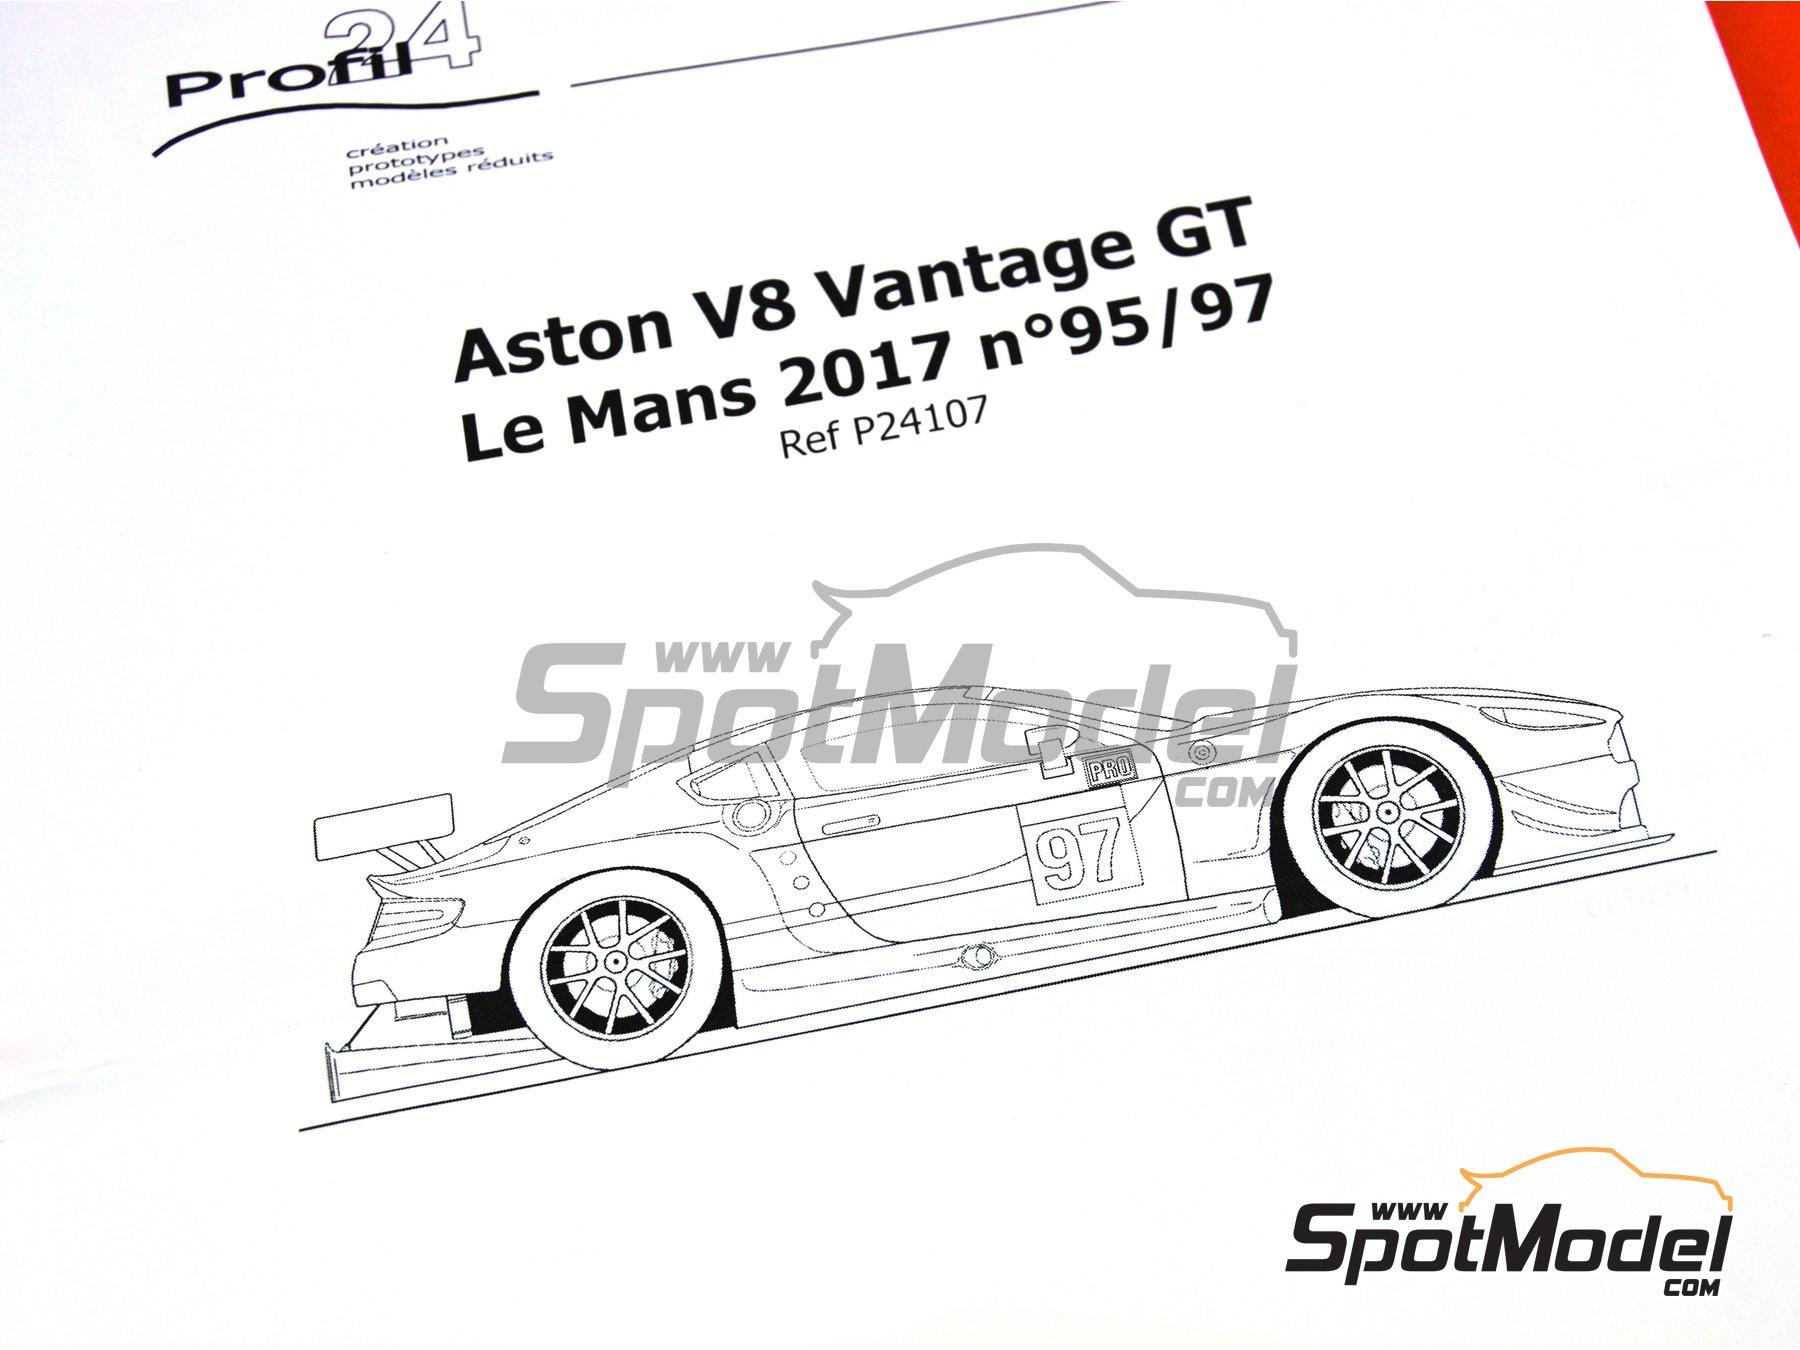 Image 11: Aston Martin V8 Vantage GTE Aston Martin Racing - 24 Horas de Le Mans 2017 | Maqueta de coche en escala1/24 fabricado por Profil24 (ref.P24107)